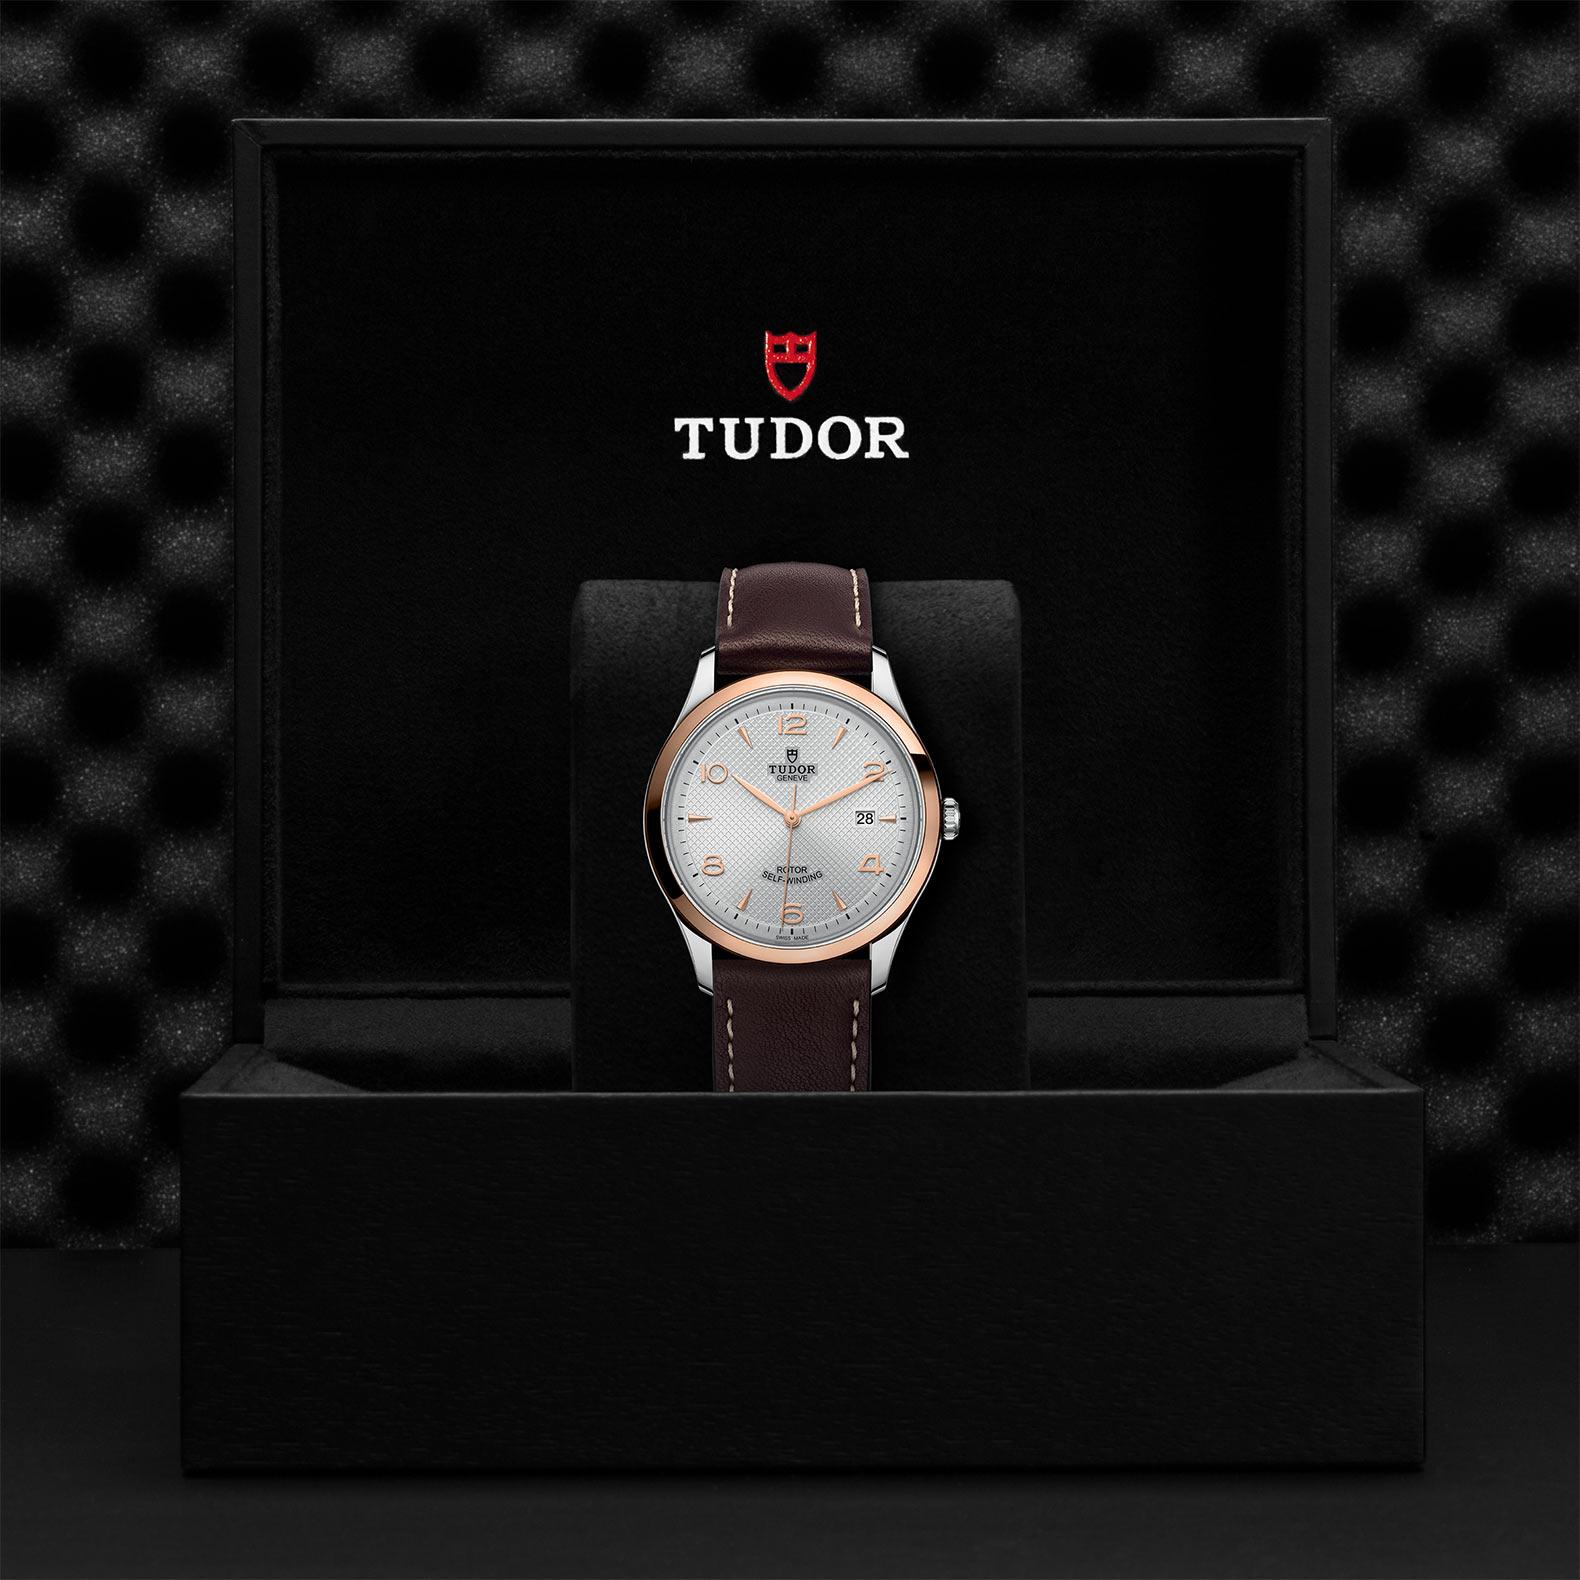 TUDOR 1926 - M91651-0005